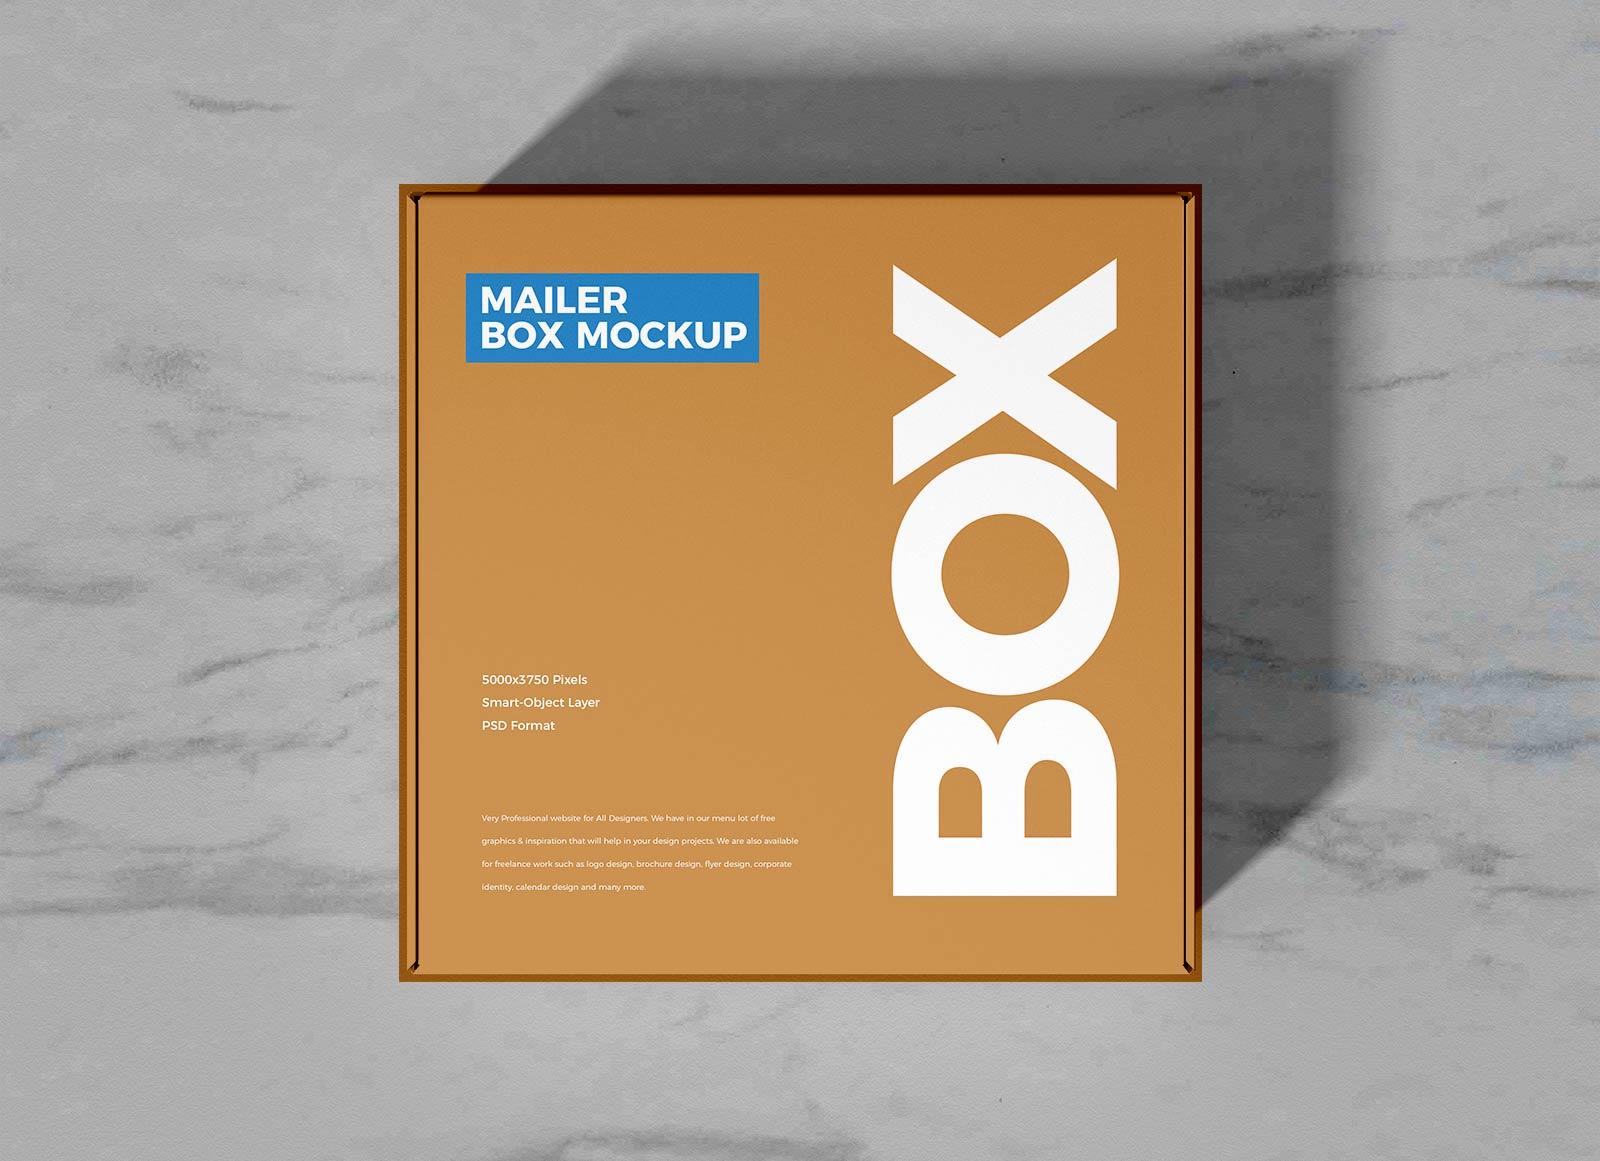 Free-Cardboard-Mailer-Box-Mockup-PSD